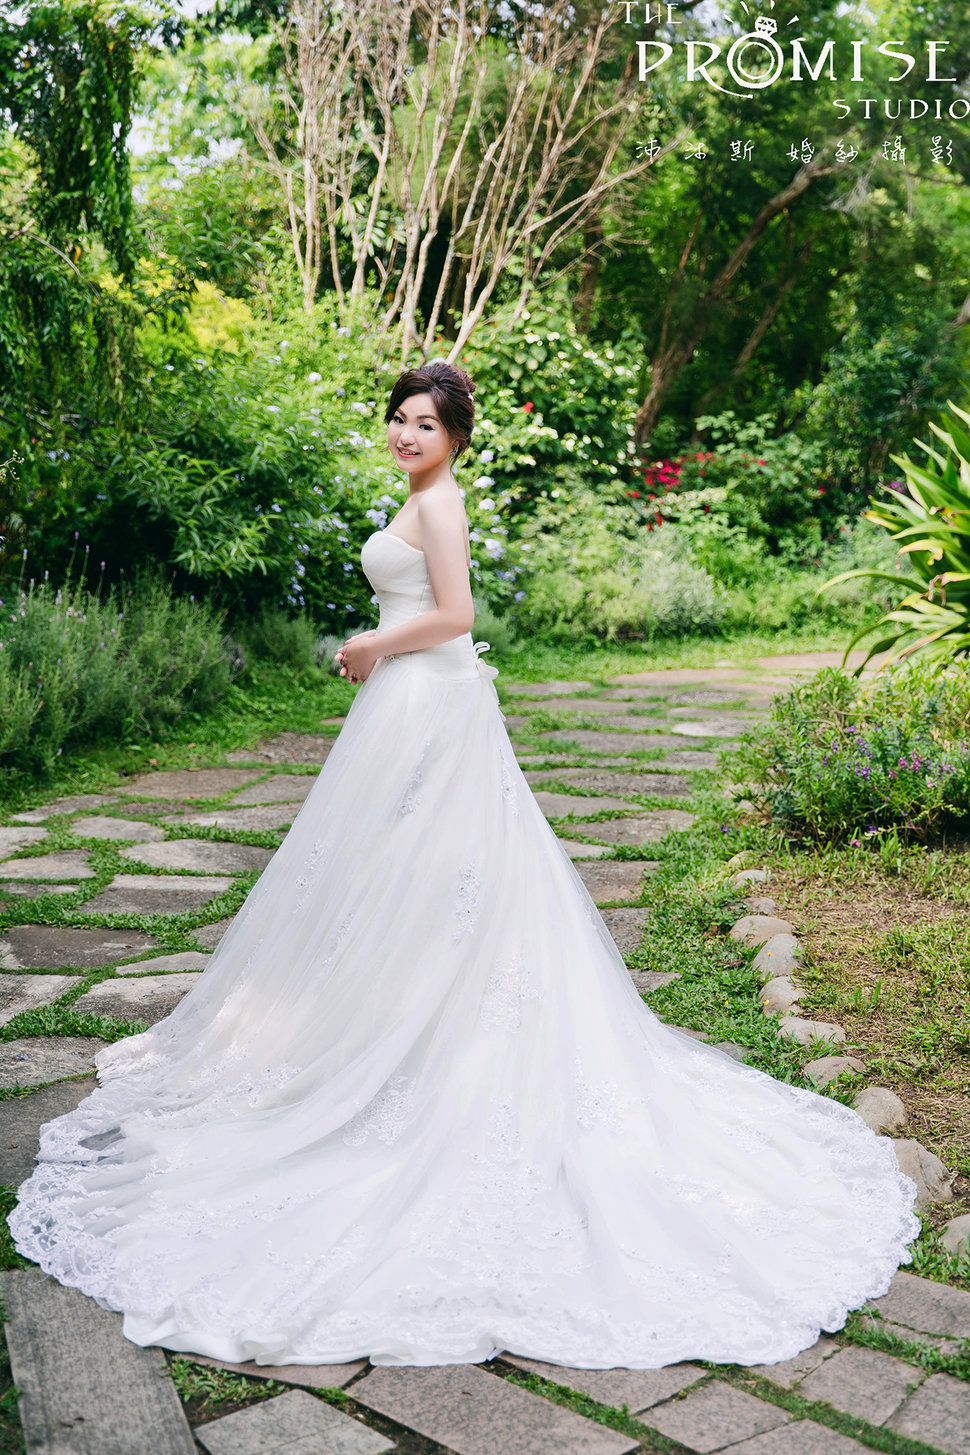 IMG_0743 - 沛沐斯婚紗攝影 - 結婚吧